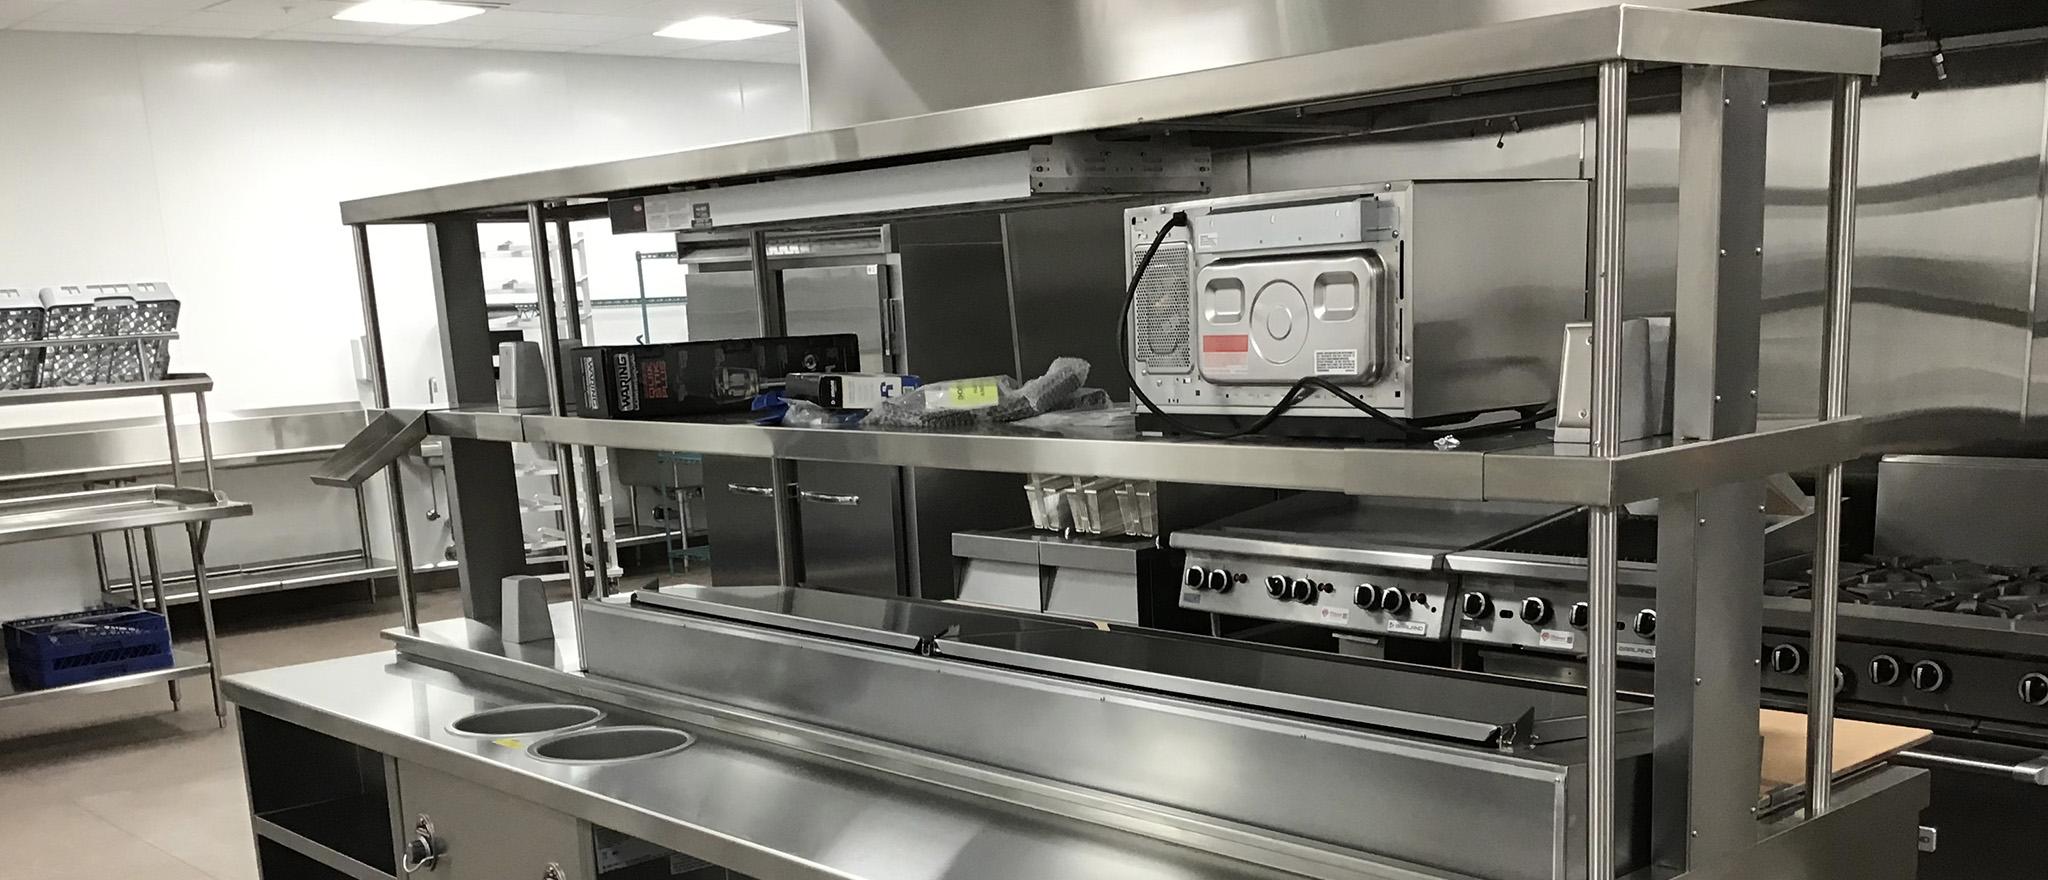 Commercial Kitchen Workstation